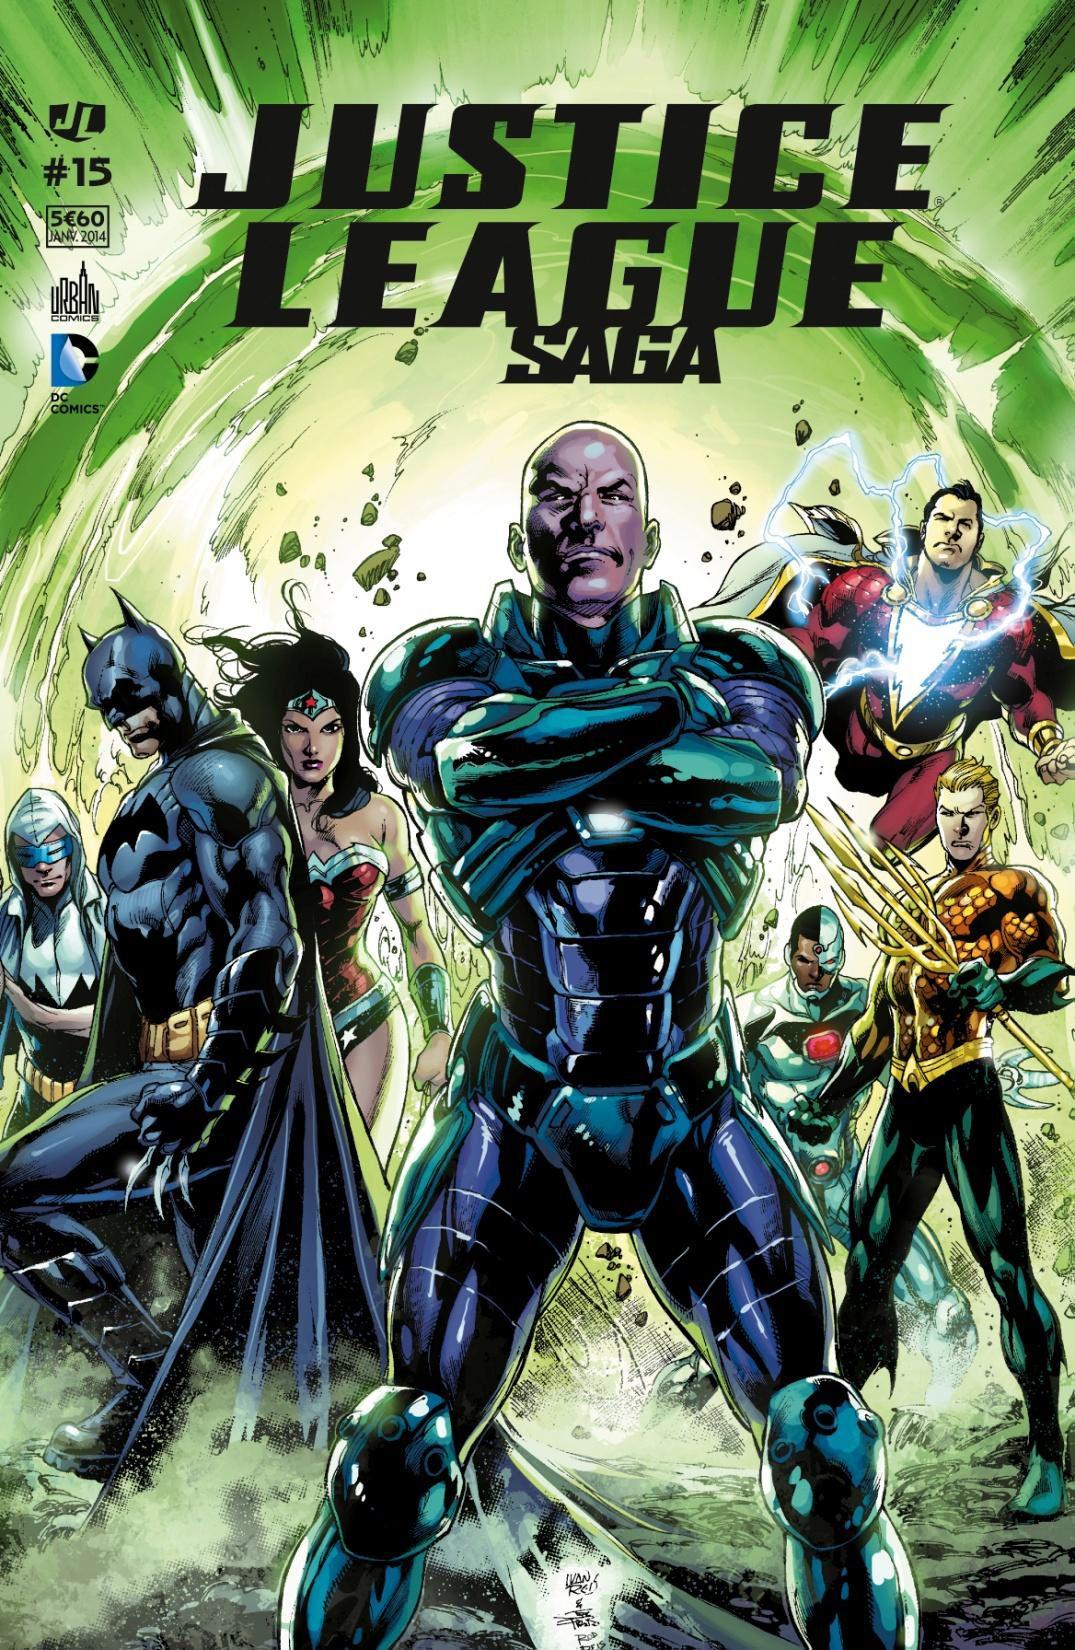 Justice League Saga 15